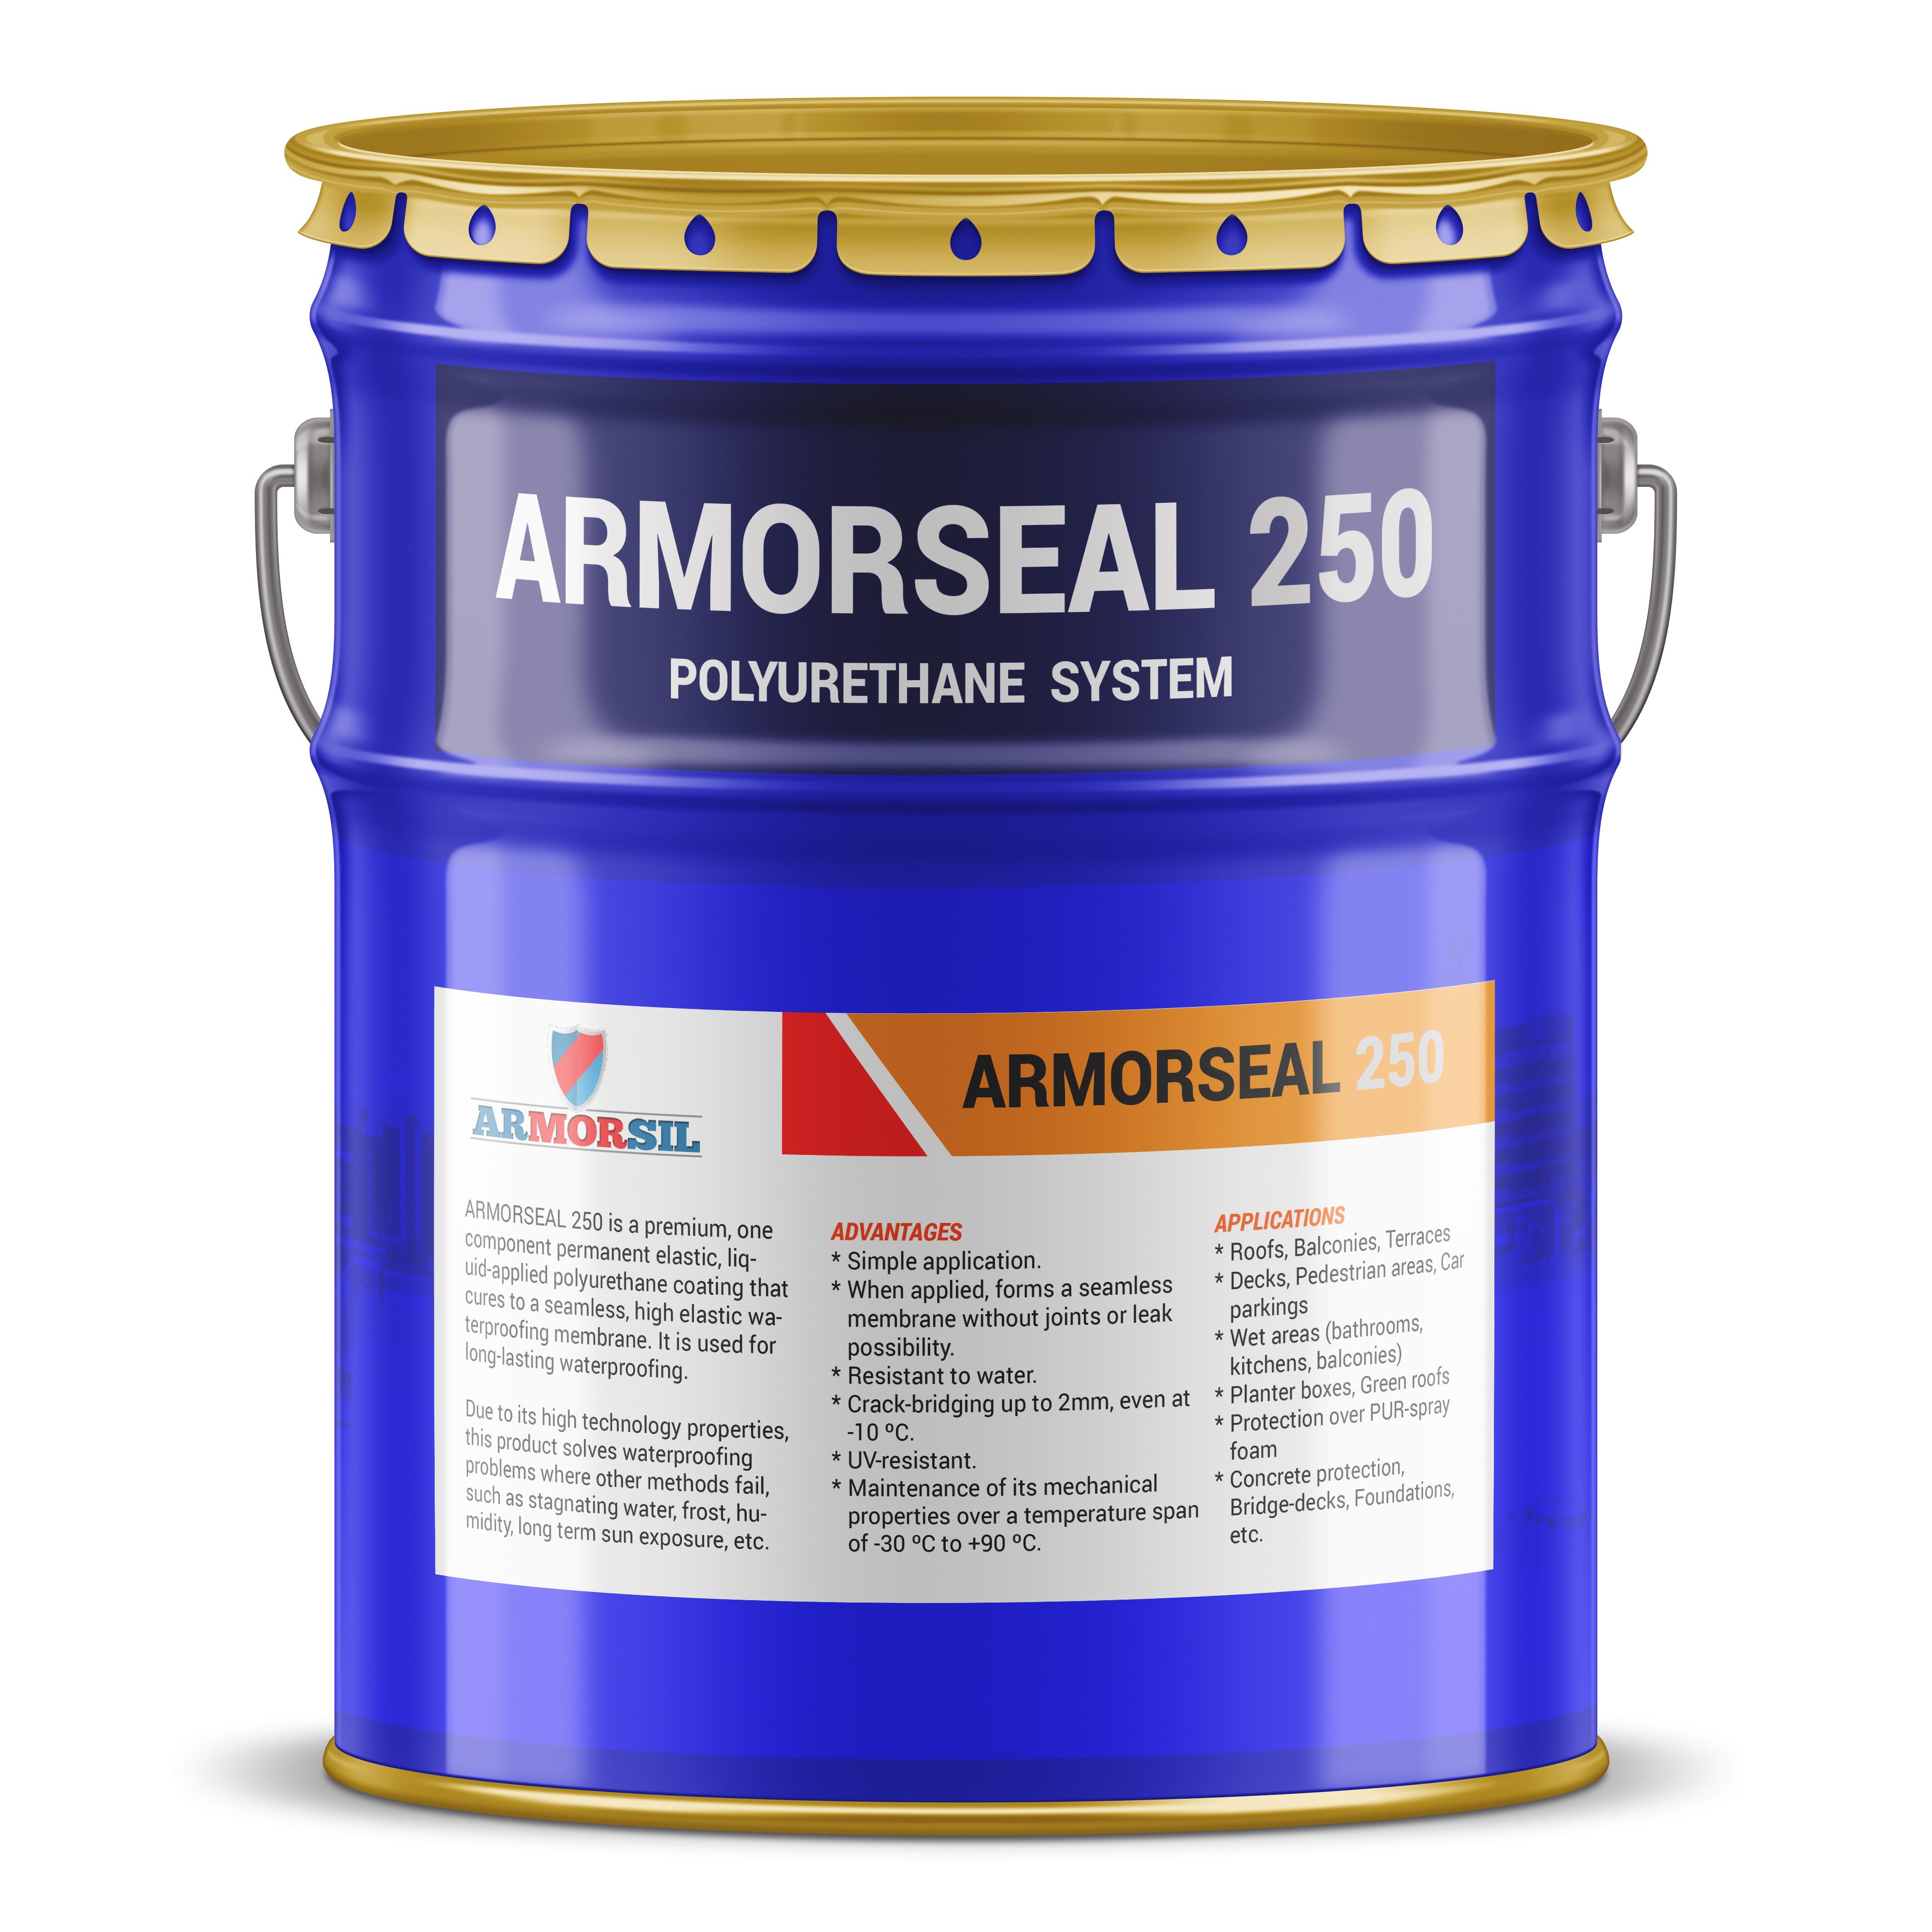 Armorseal-250-polyurethane-waterproofing-membrane